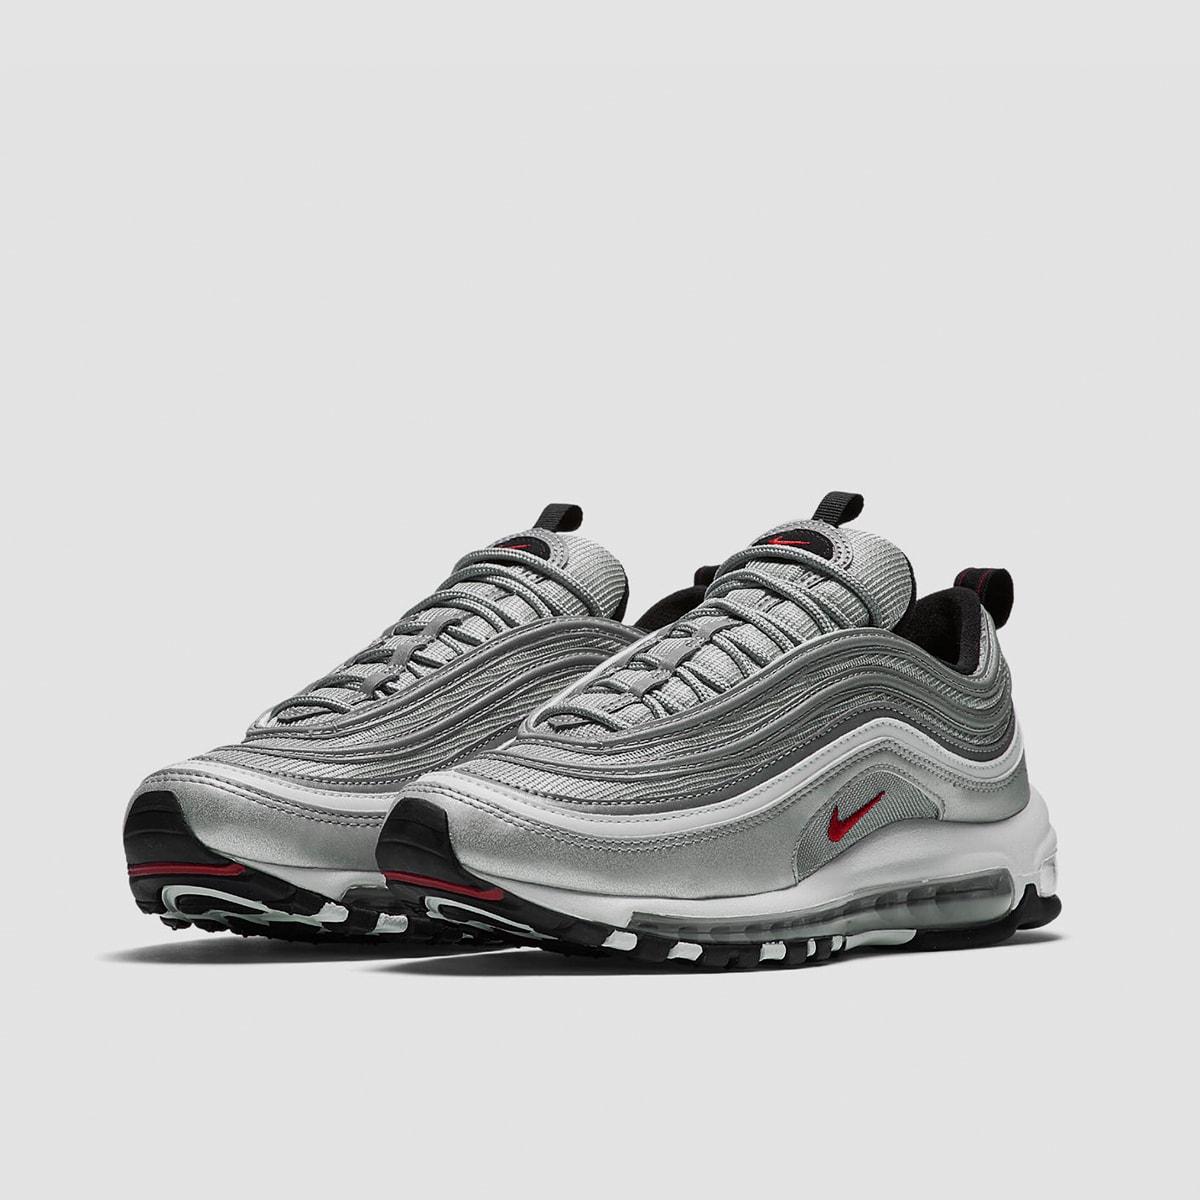 Nike W's Air Max 97 OG QS 'Italy' 885691 001